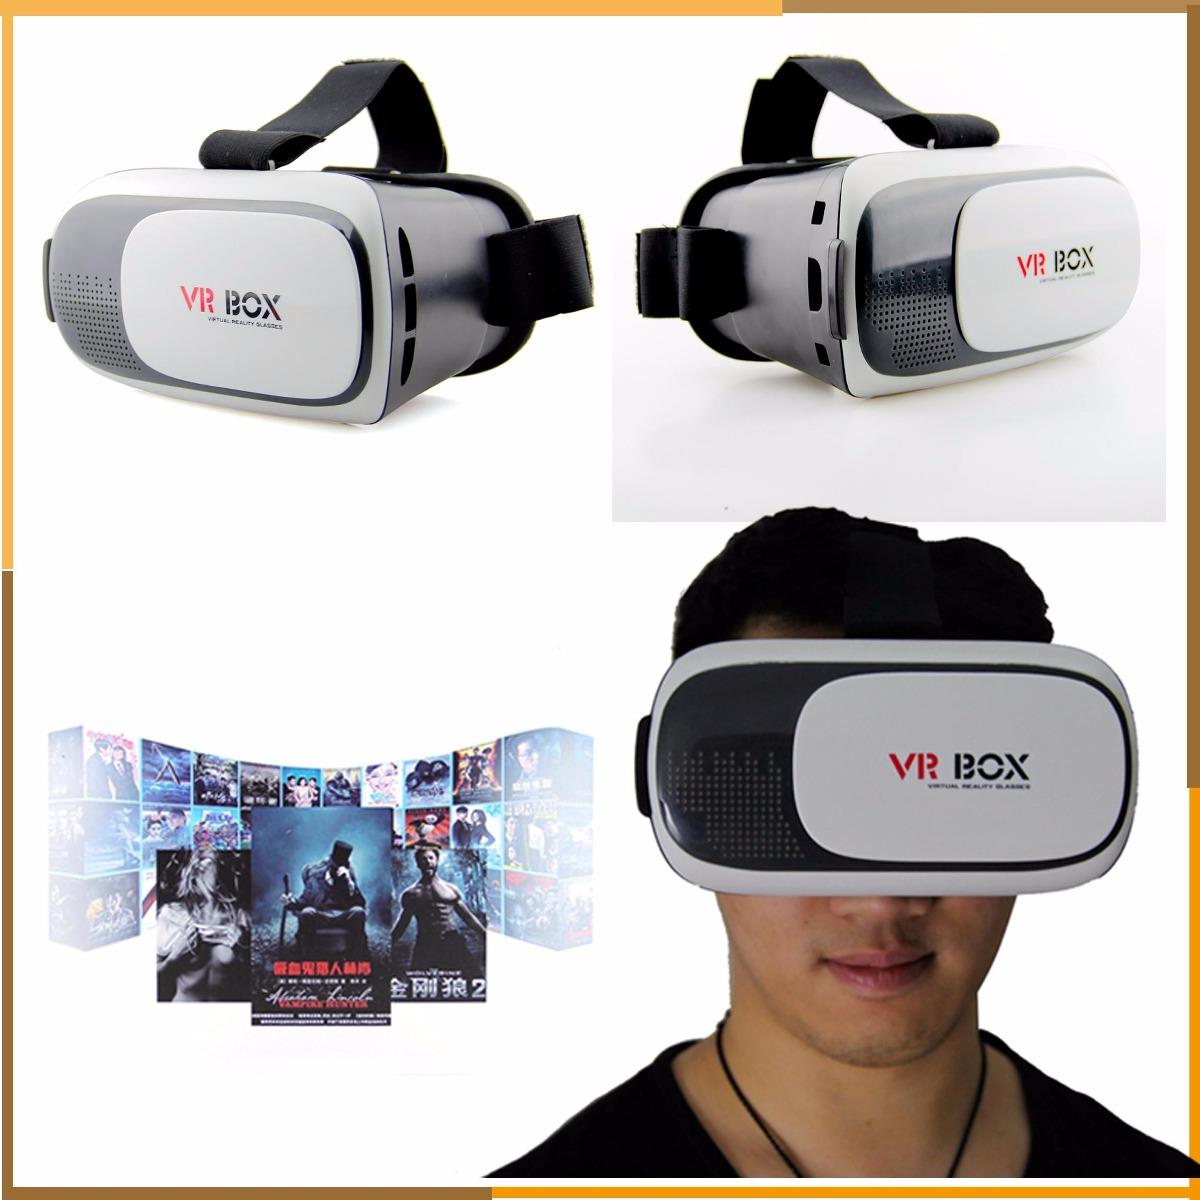 lentes de realidad virtual aumentada 3d vr box 2 0 2016 en mercado libre. Black Bedroom Furniture Sets. Home Design Ideas